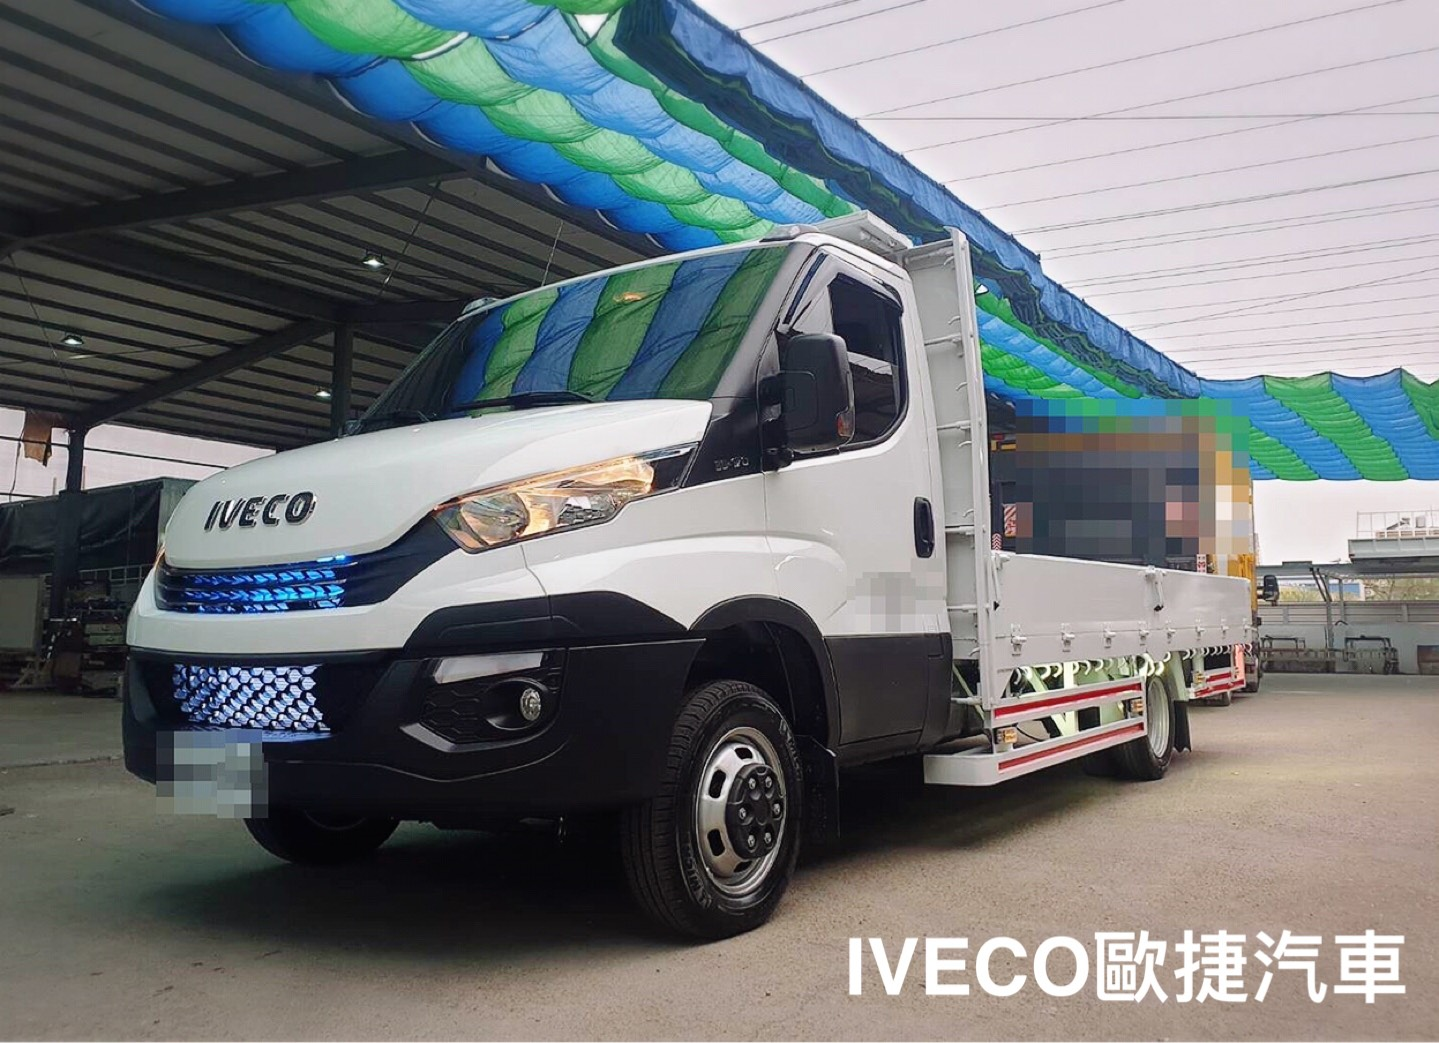 IVECO霸氣貨車燈照耀前行